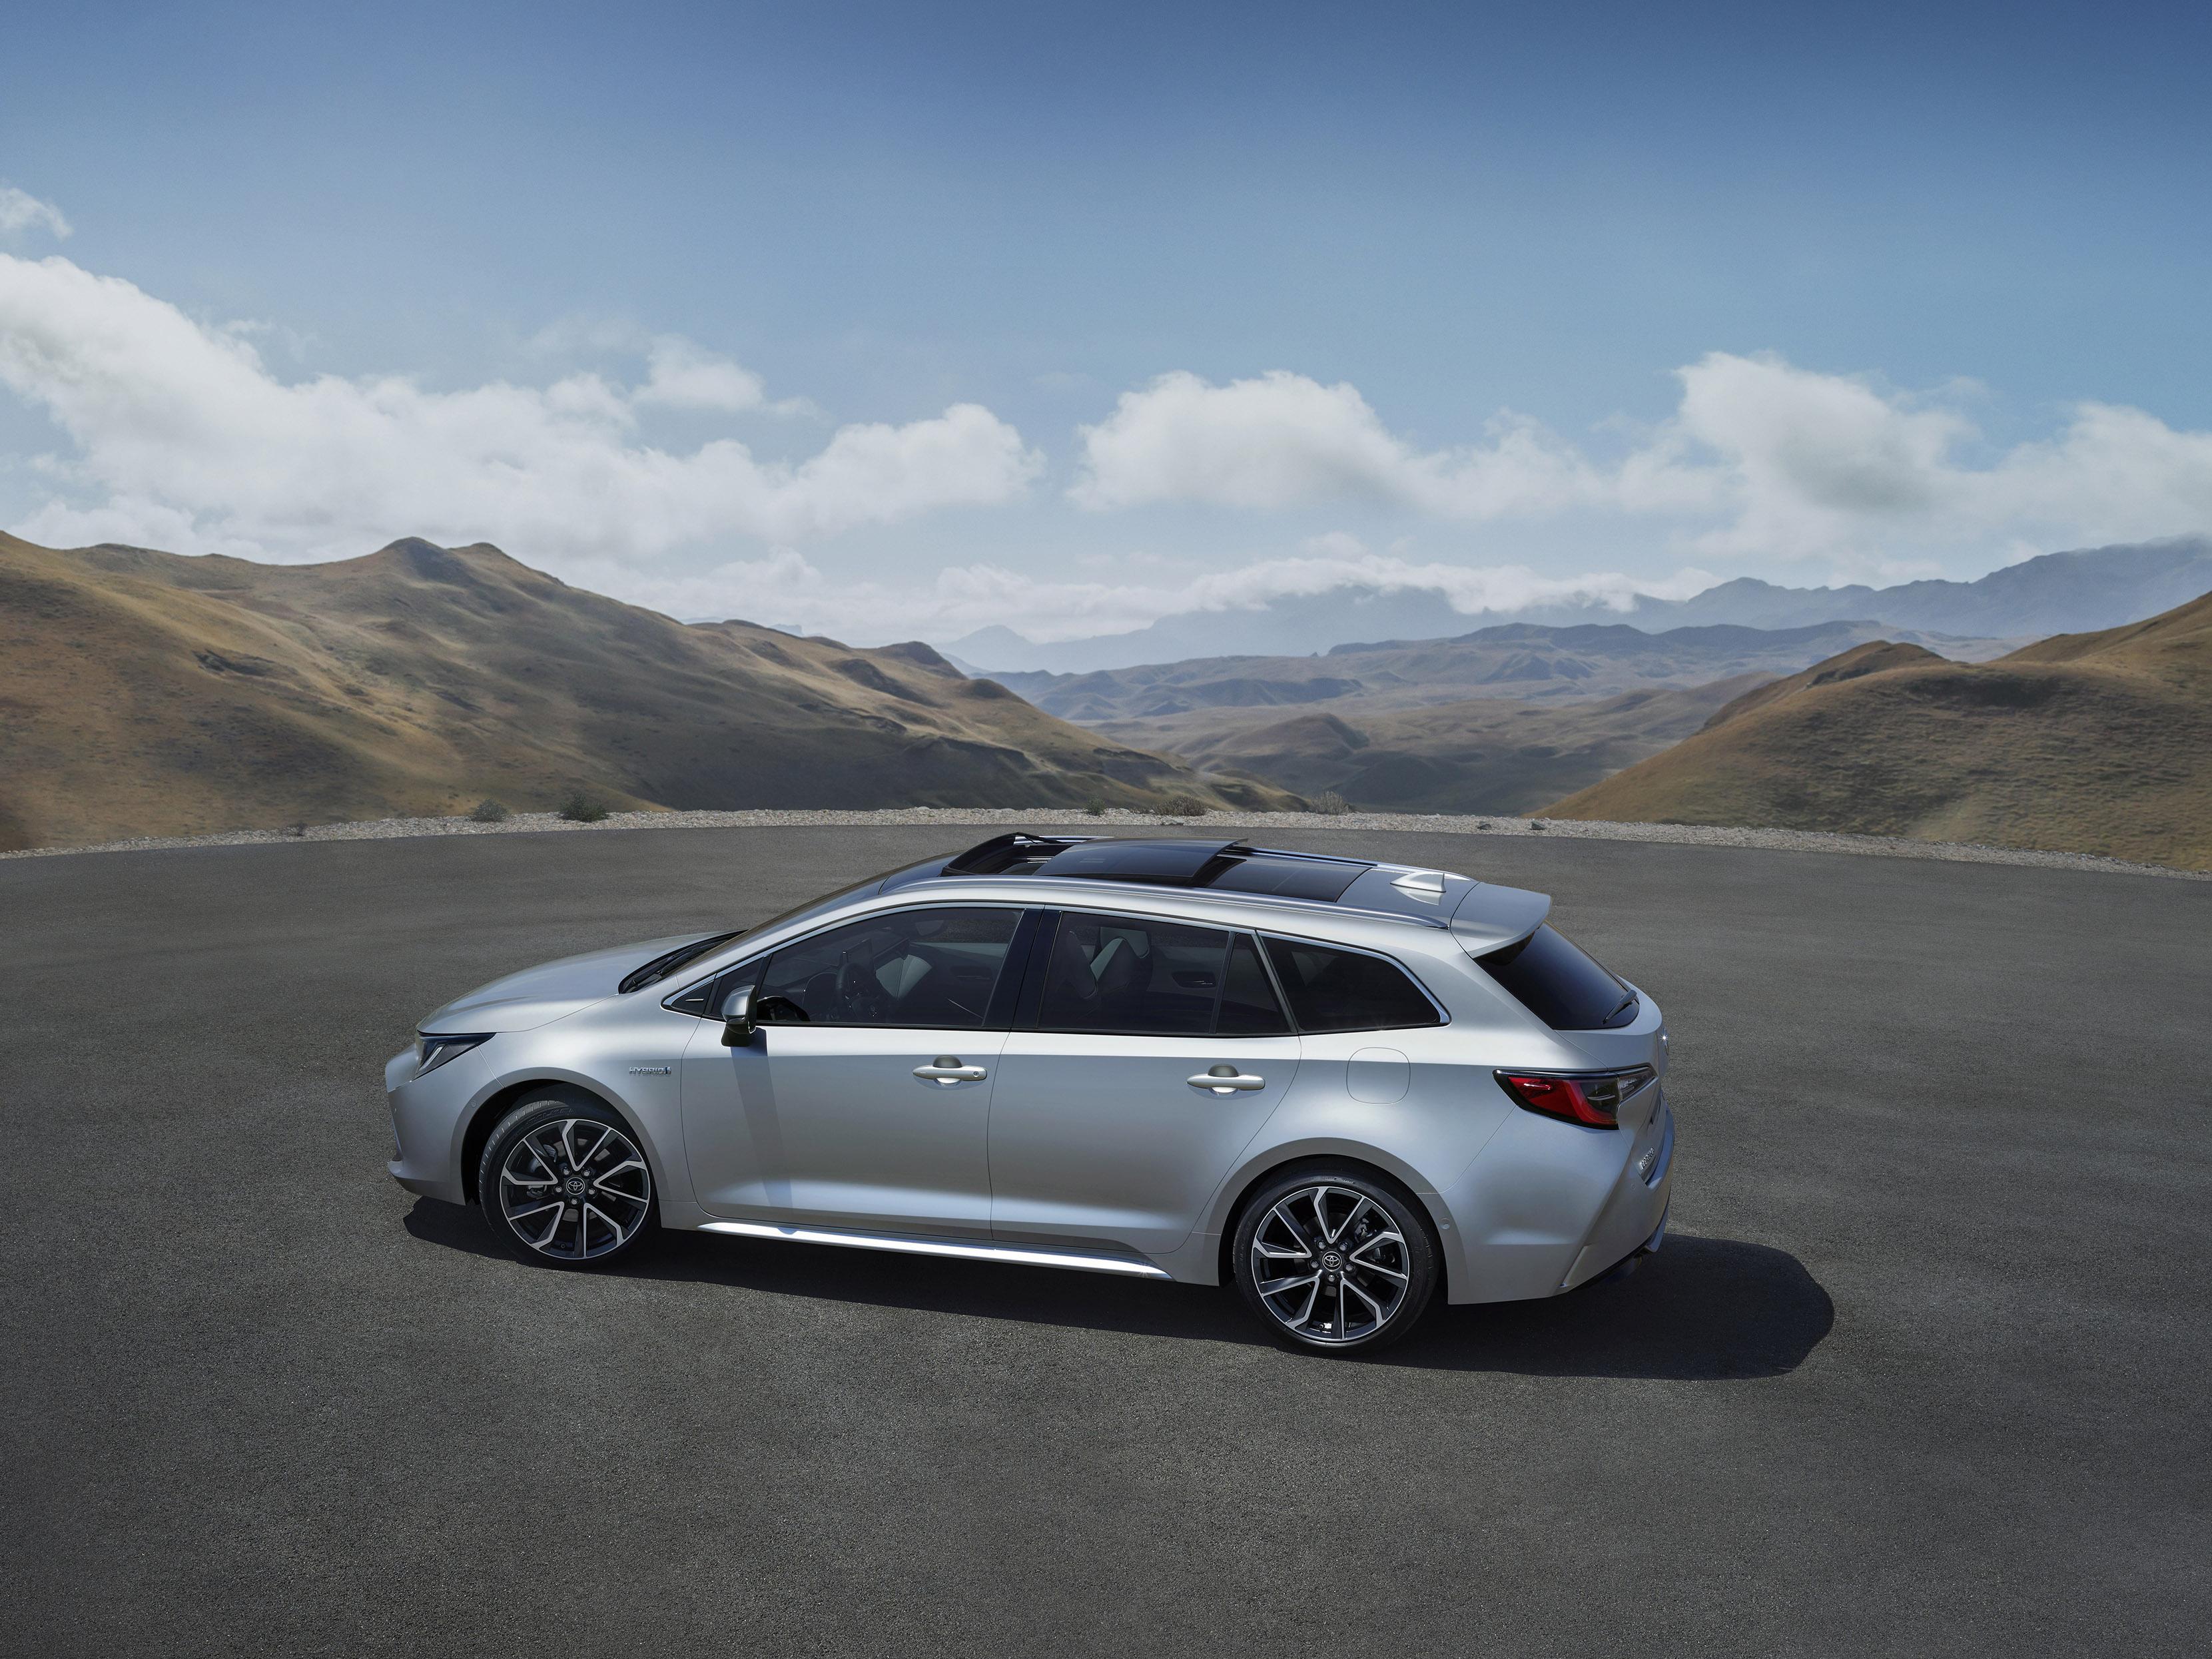 Toyota-Corolla-Touring-Sports zijkant